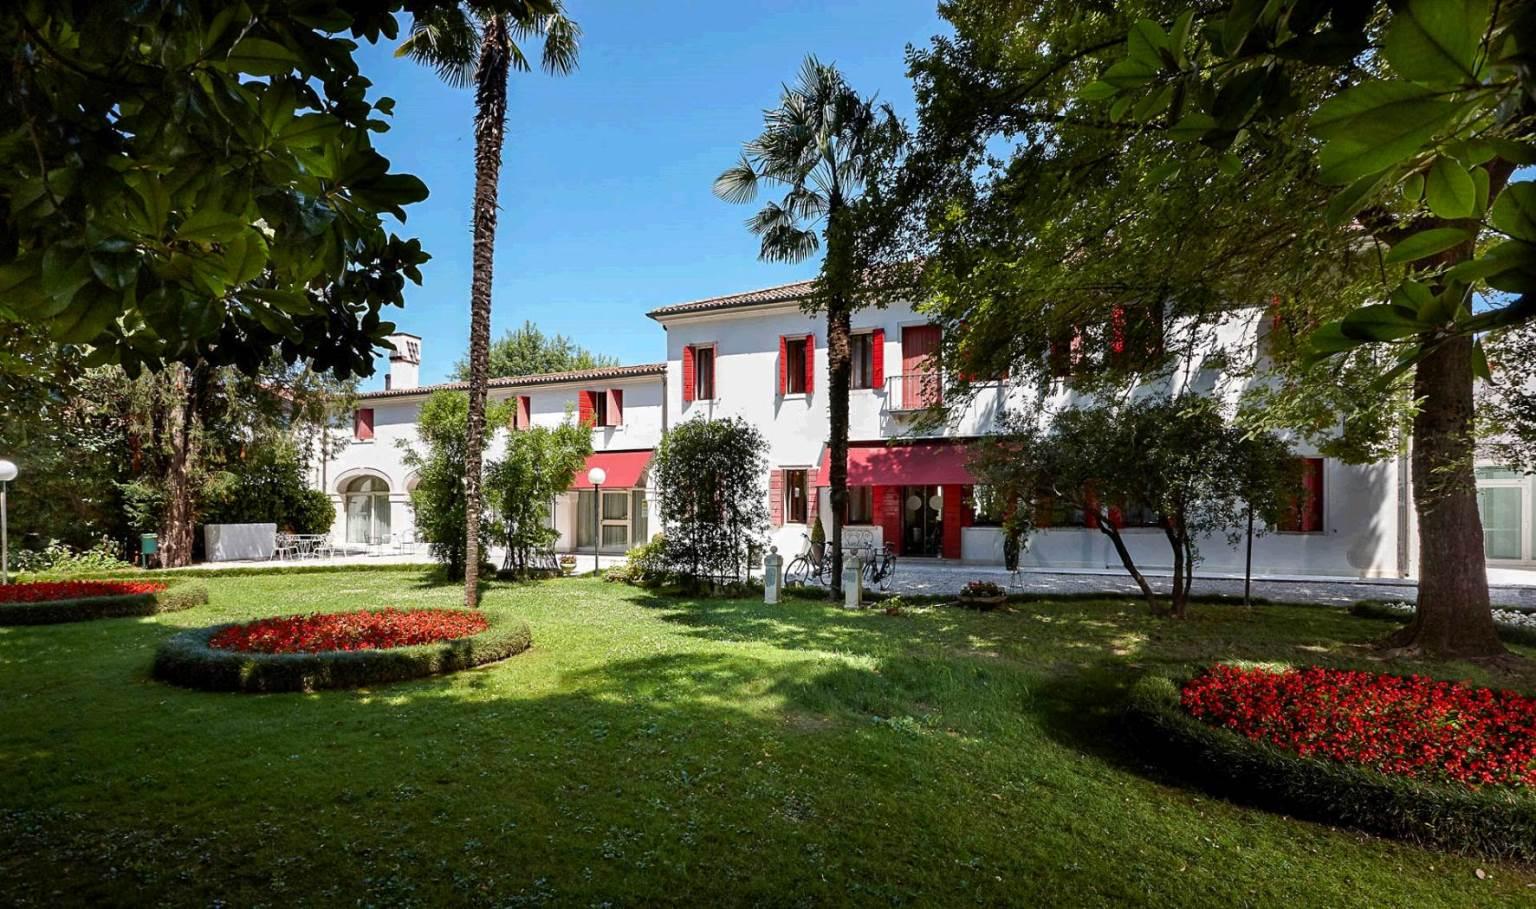 Villa Patriarca Hotel Venezia